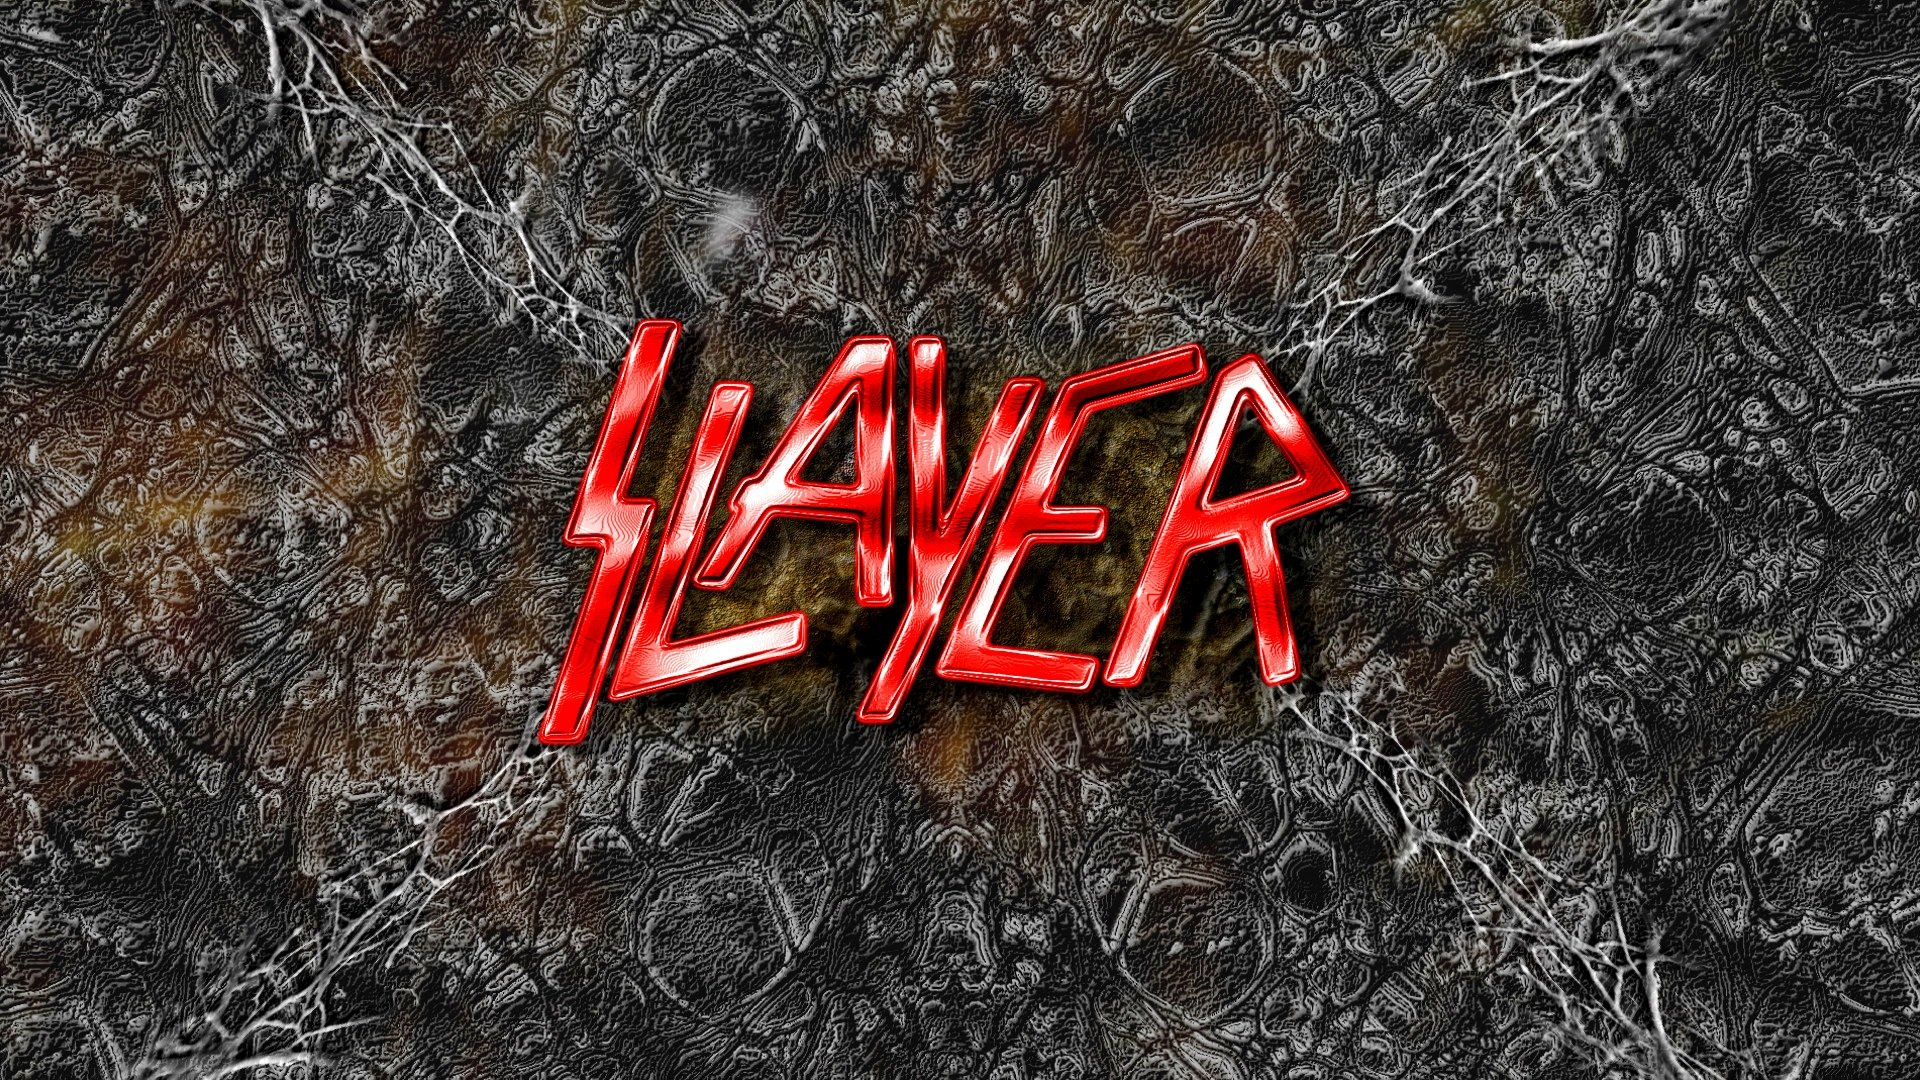 Band Made Torontomario Slayer Wallpaper 1920x1080 Full HD Wallpapers 1920x1080